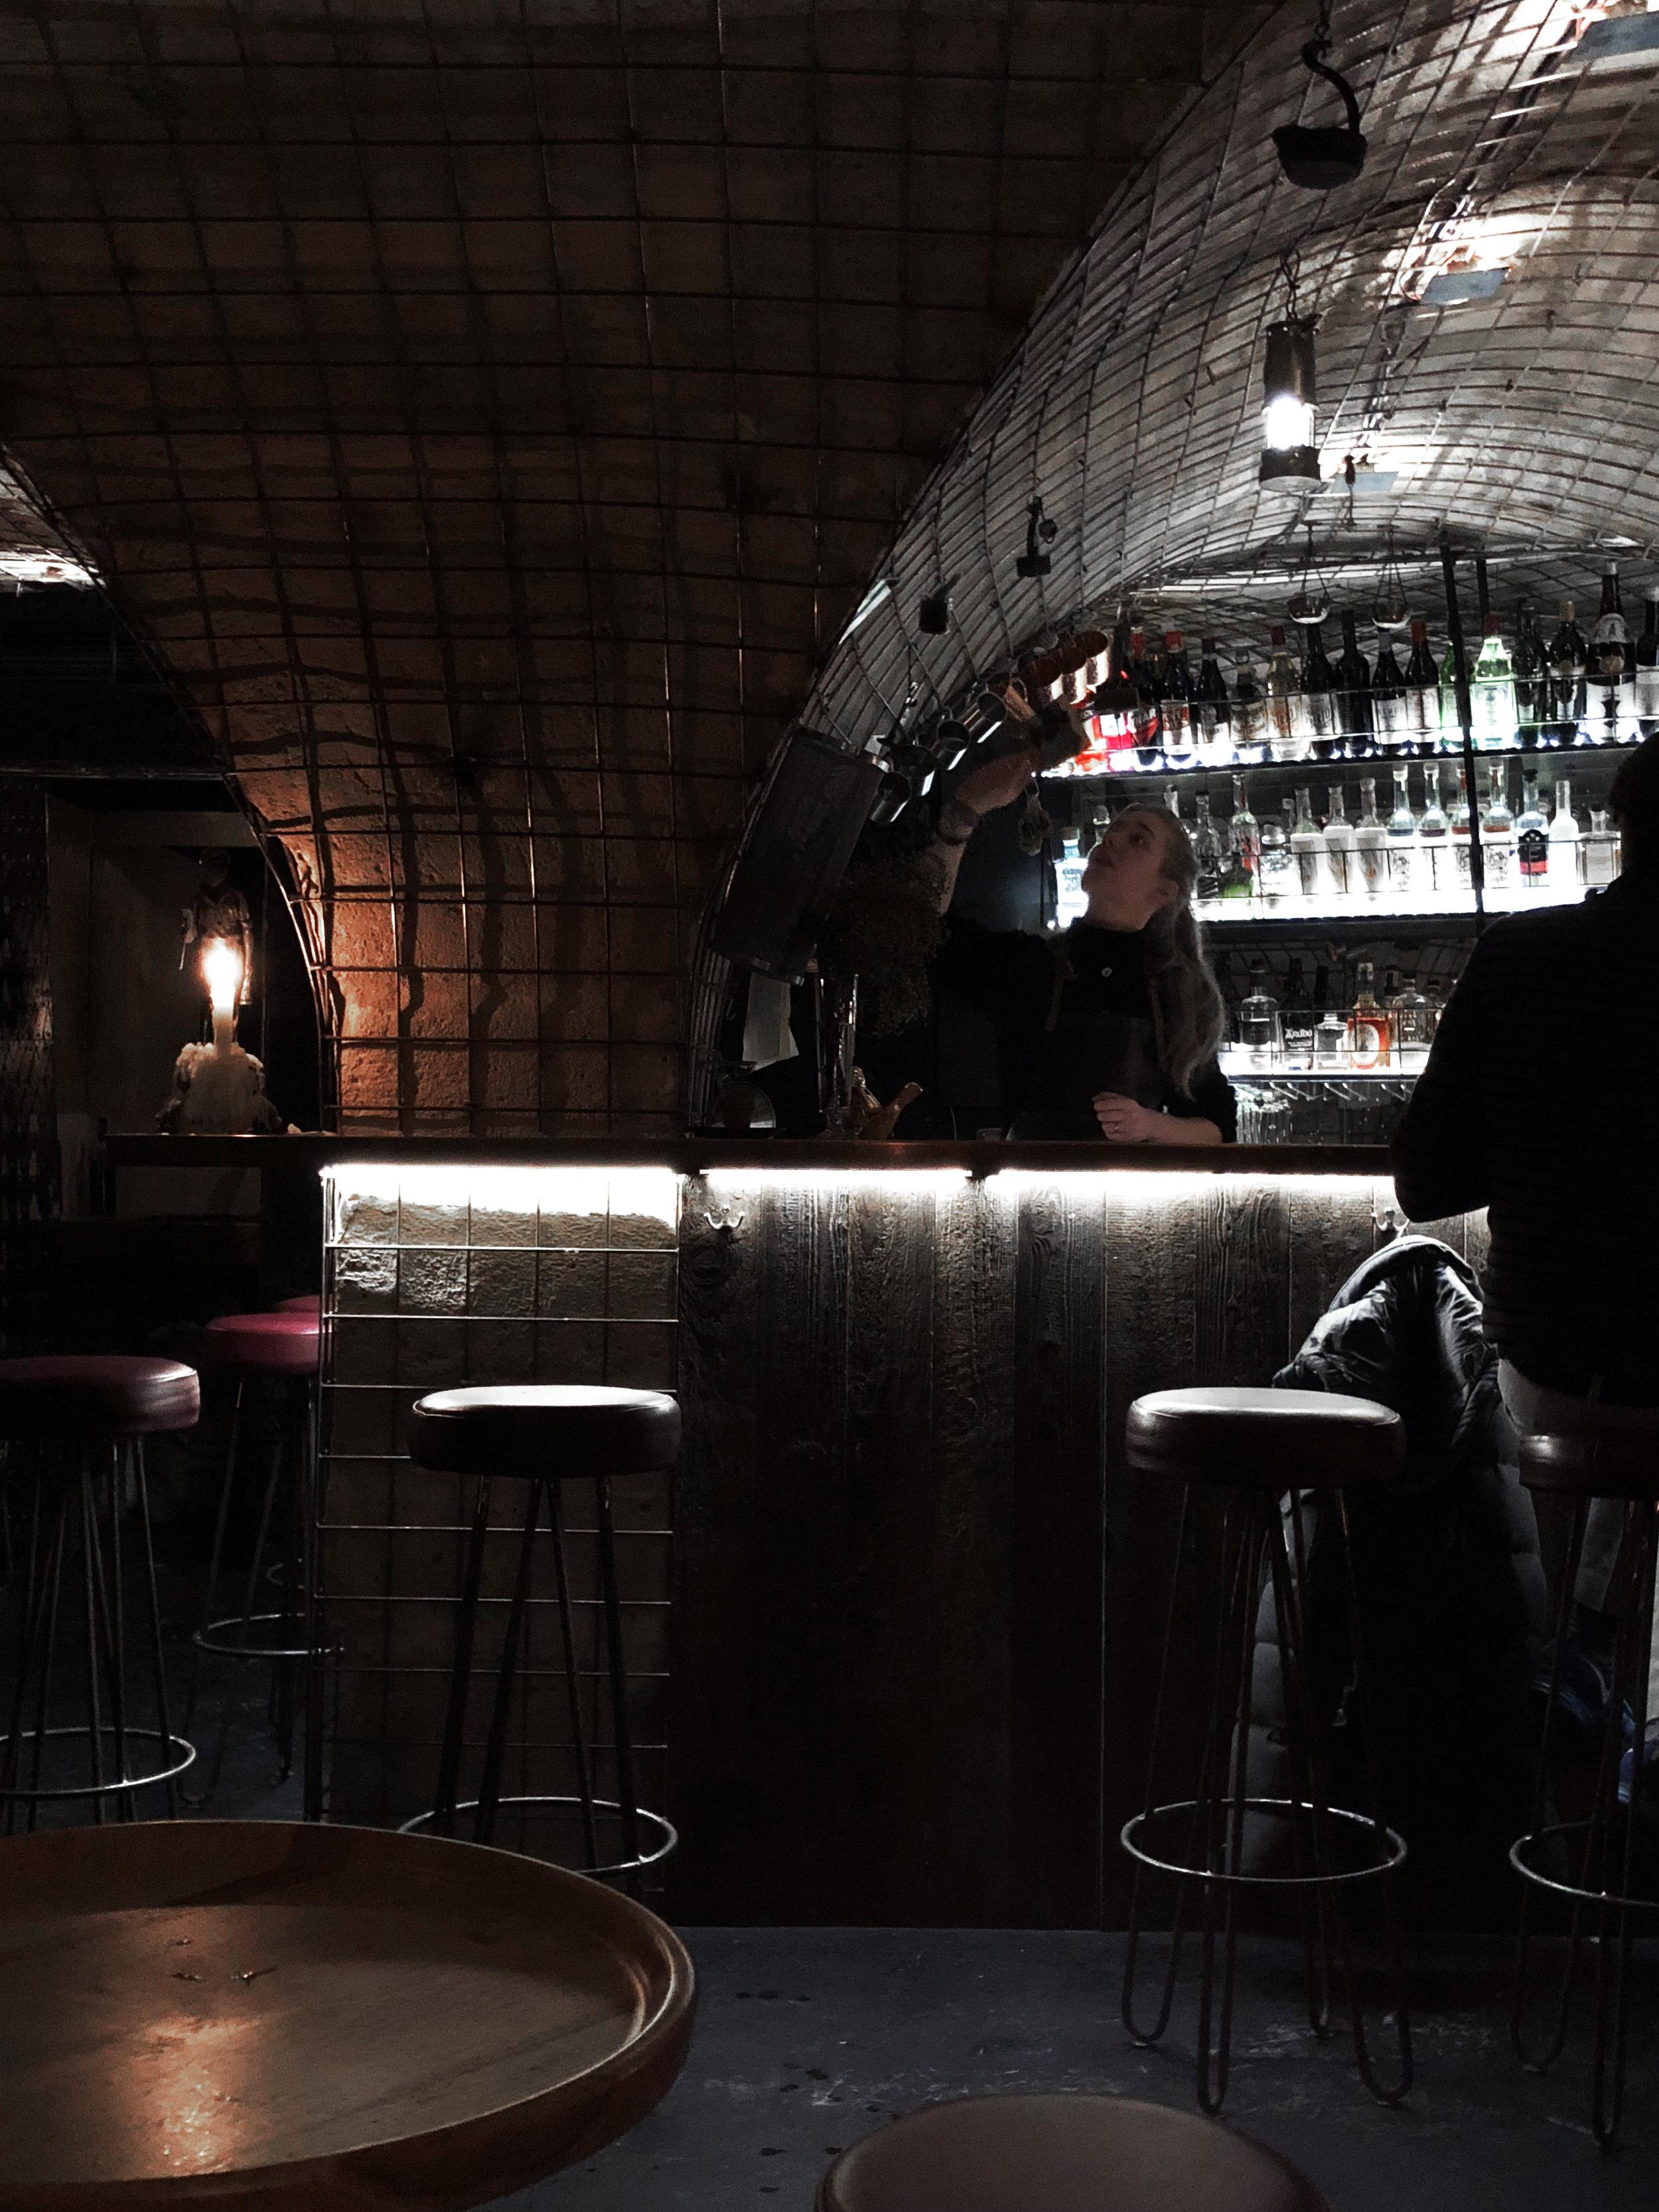 La Mina Cocktail Bar in the basement of Carbon, a restaurant in Le Marais.